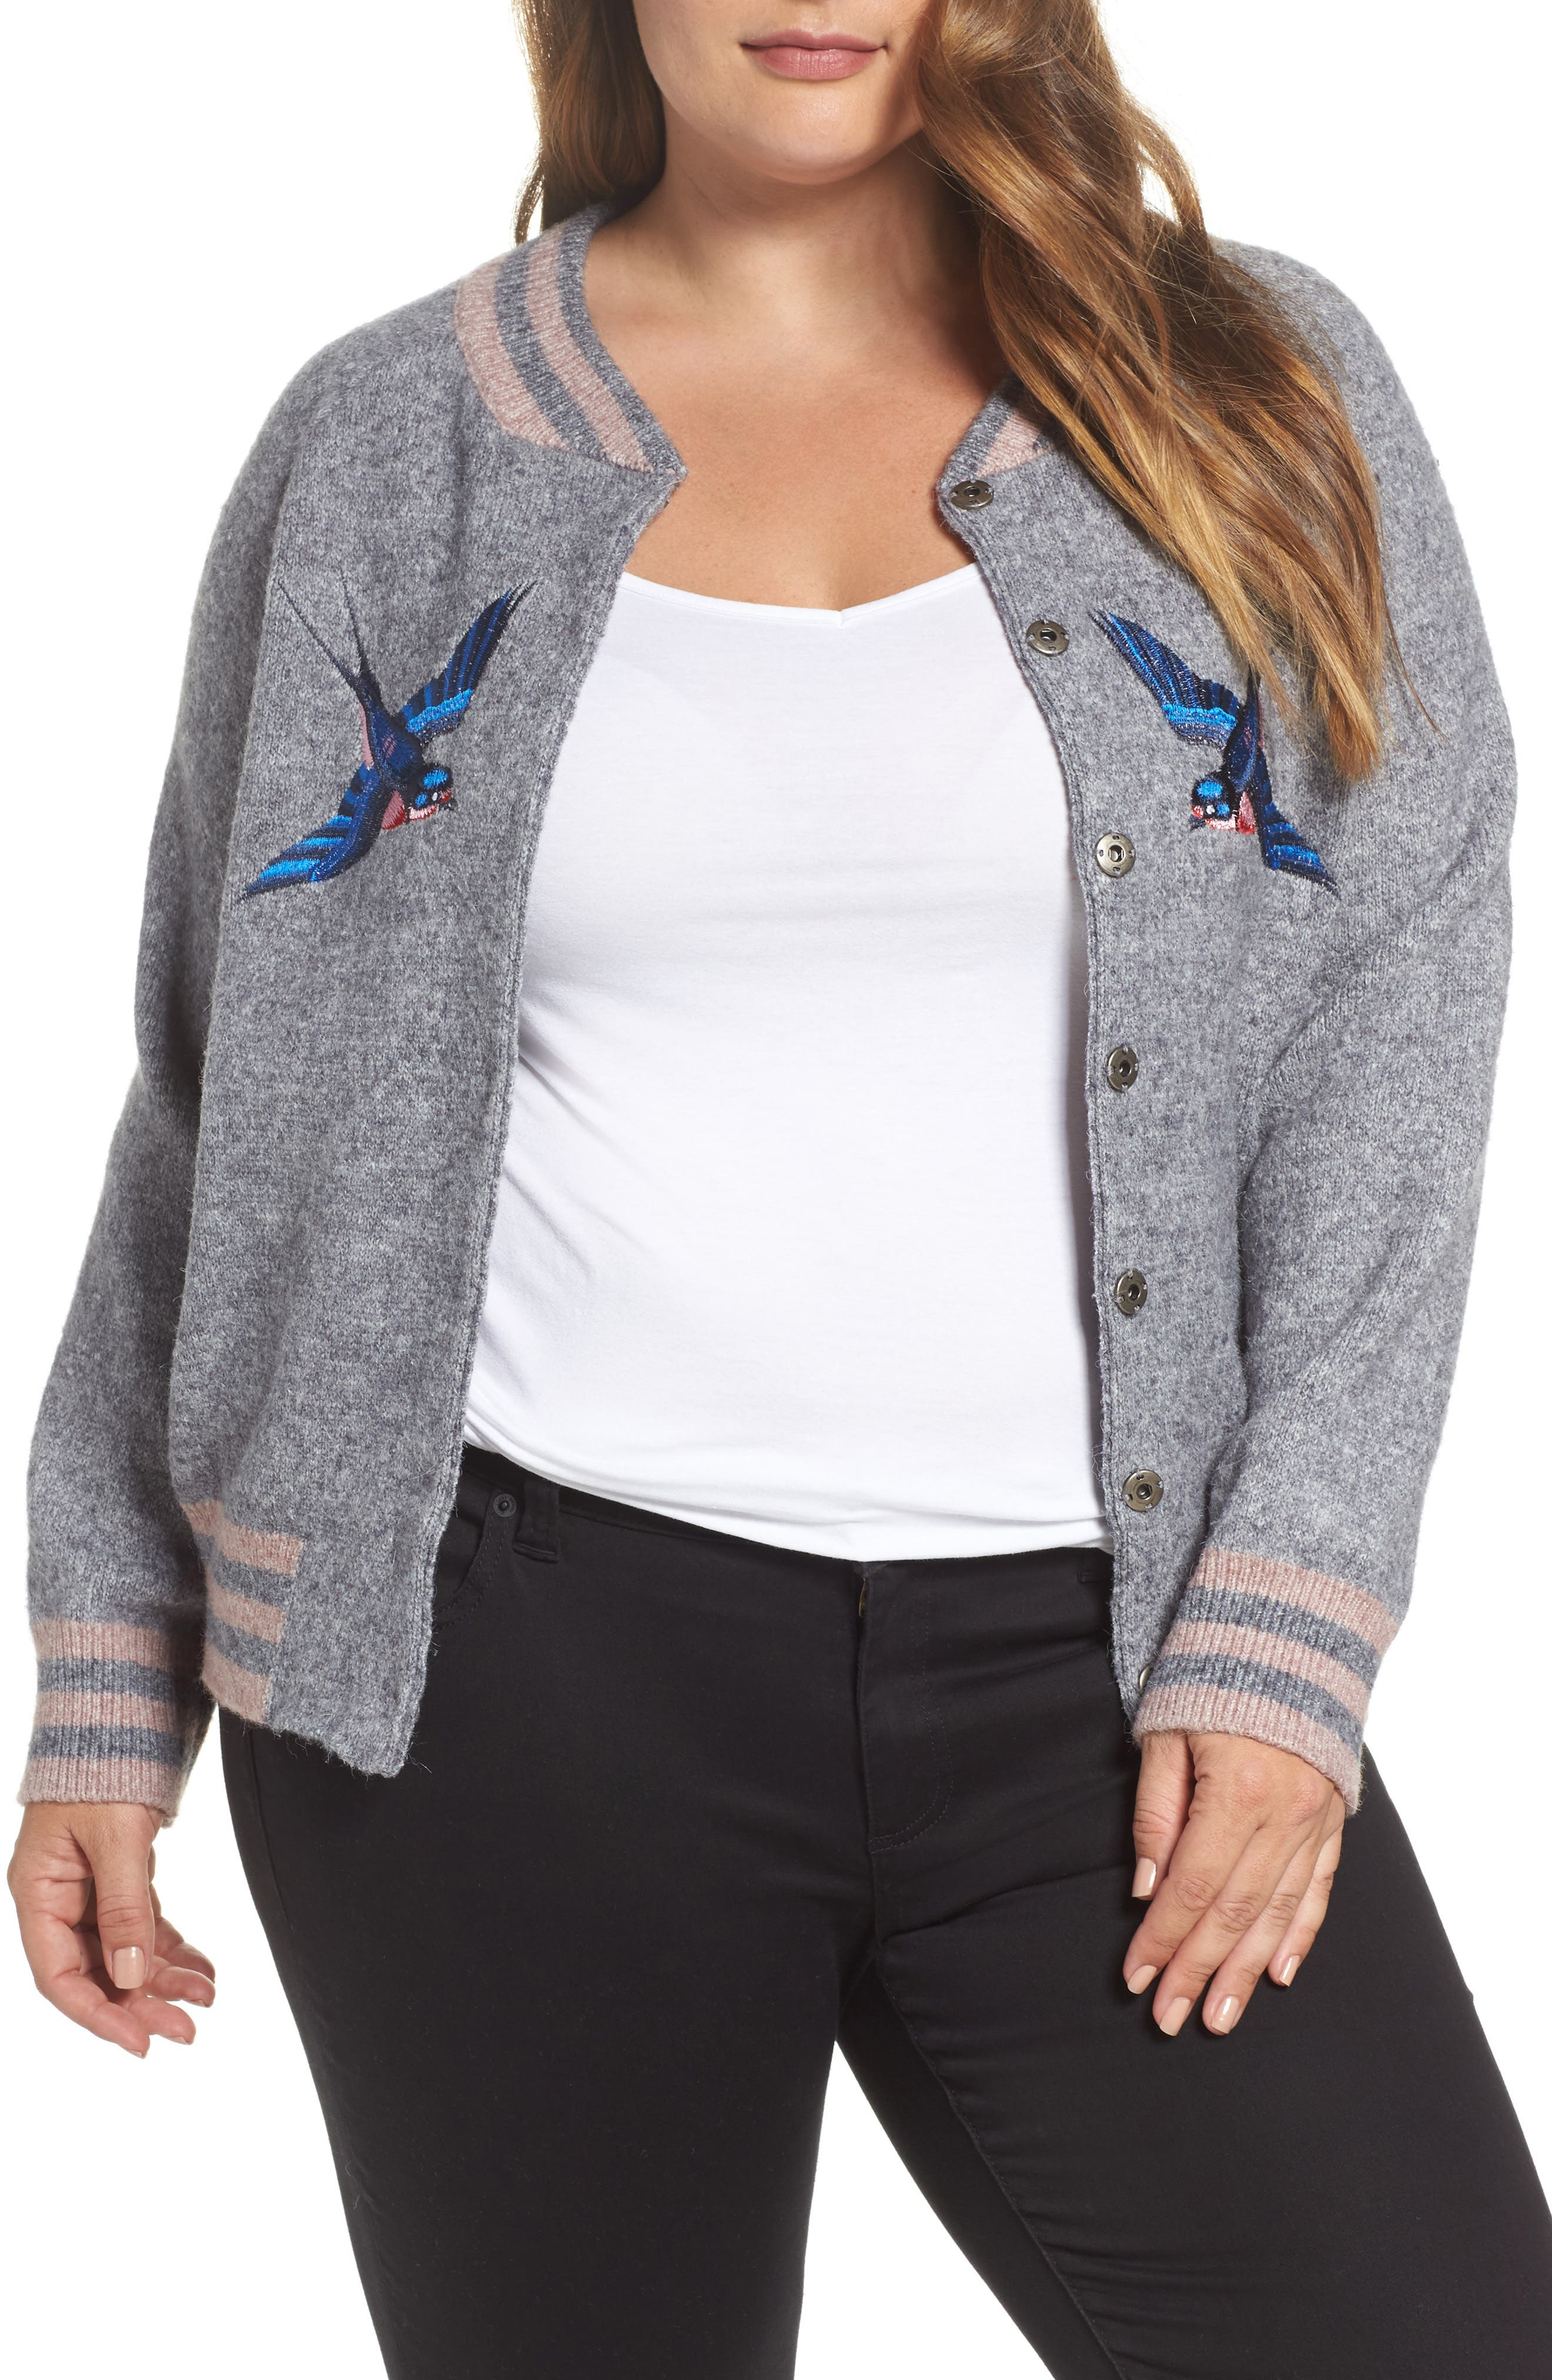 Zanja Embroidered Knit Bomber Jacket,                             Main thumbnail 1, color,                             Medium Grey Melange